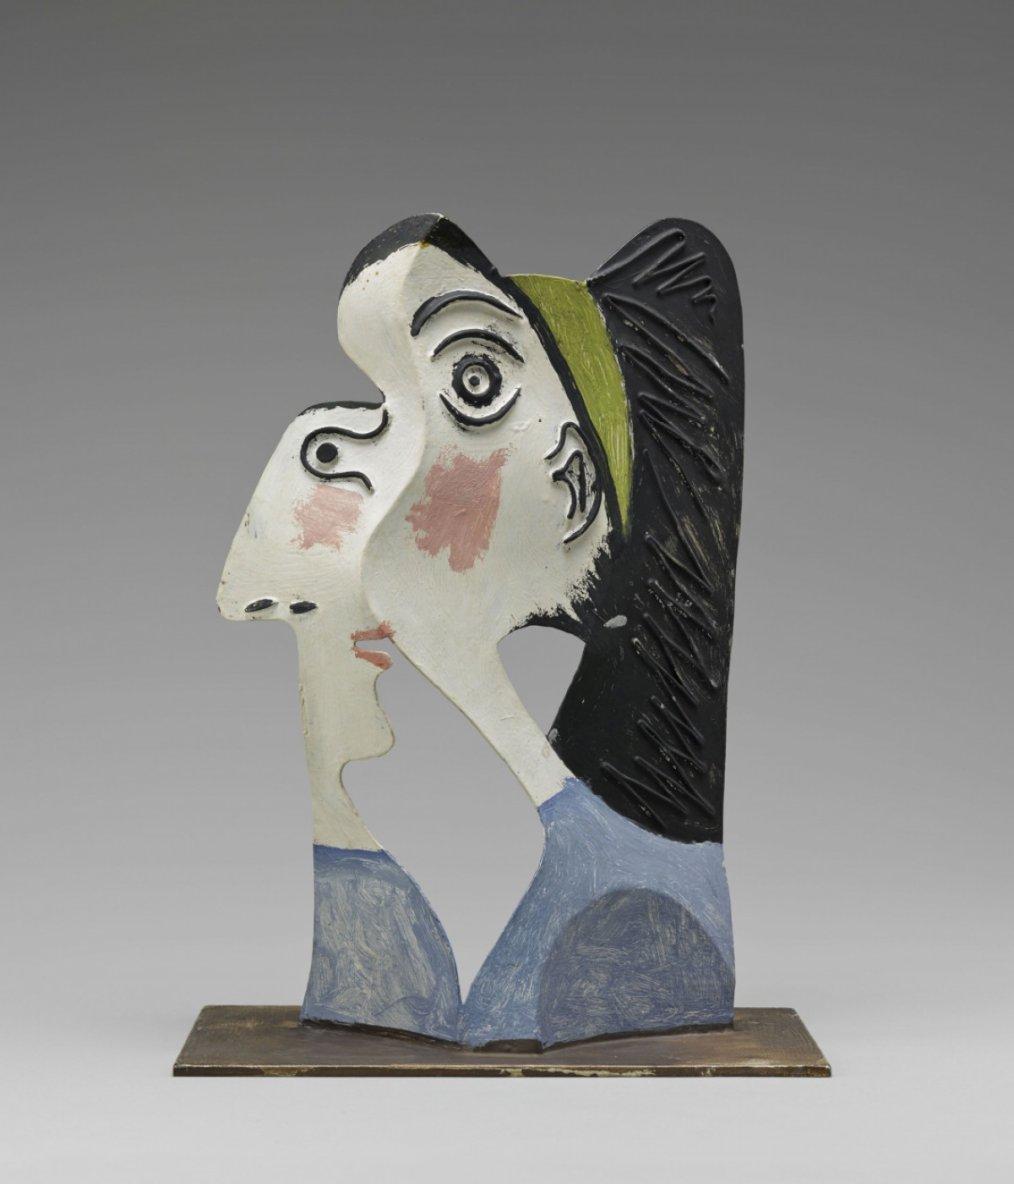 Picasso.Sculptures (BOZAR).